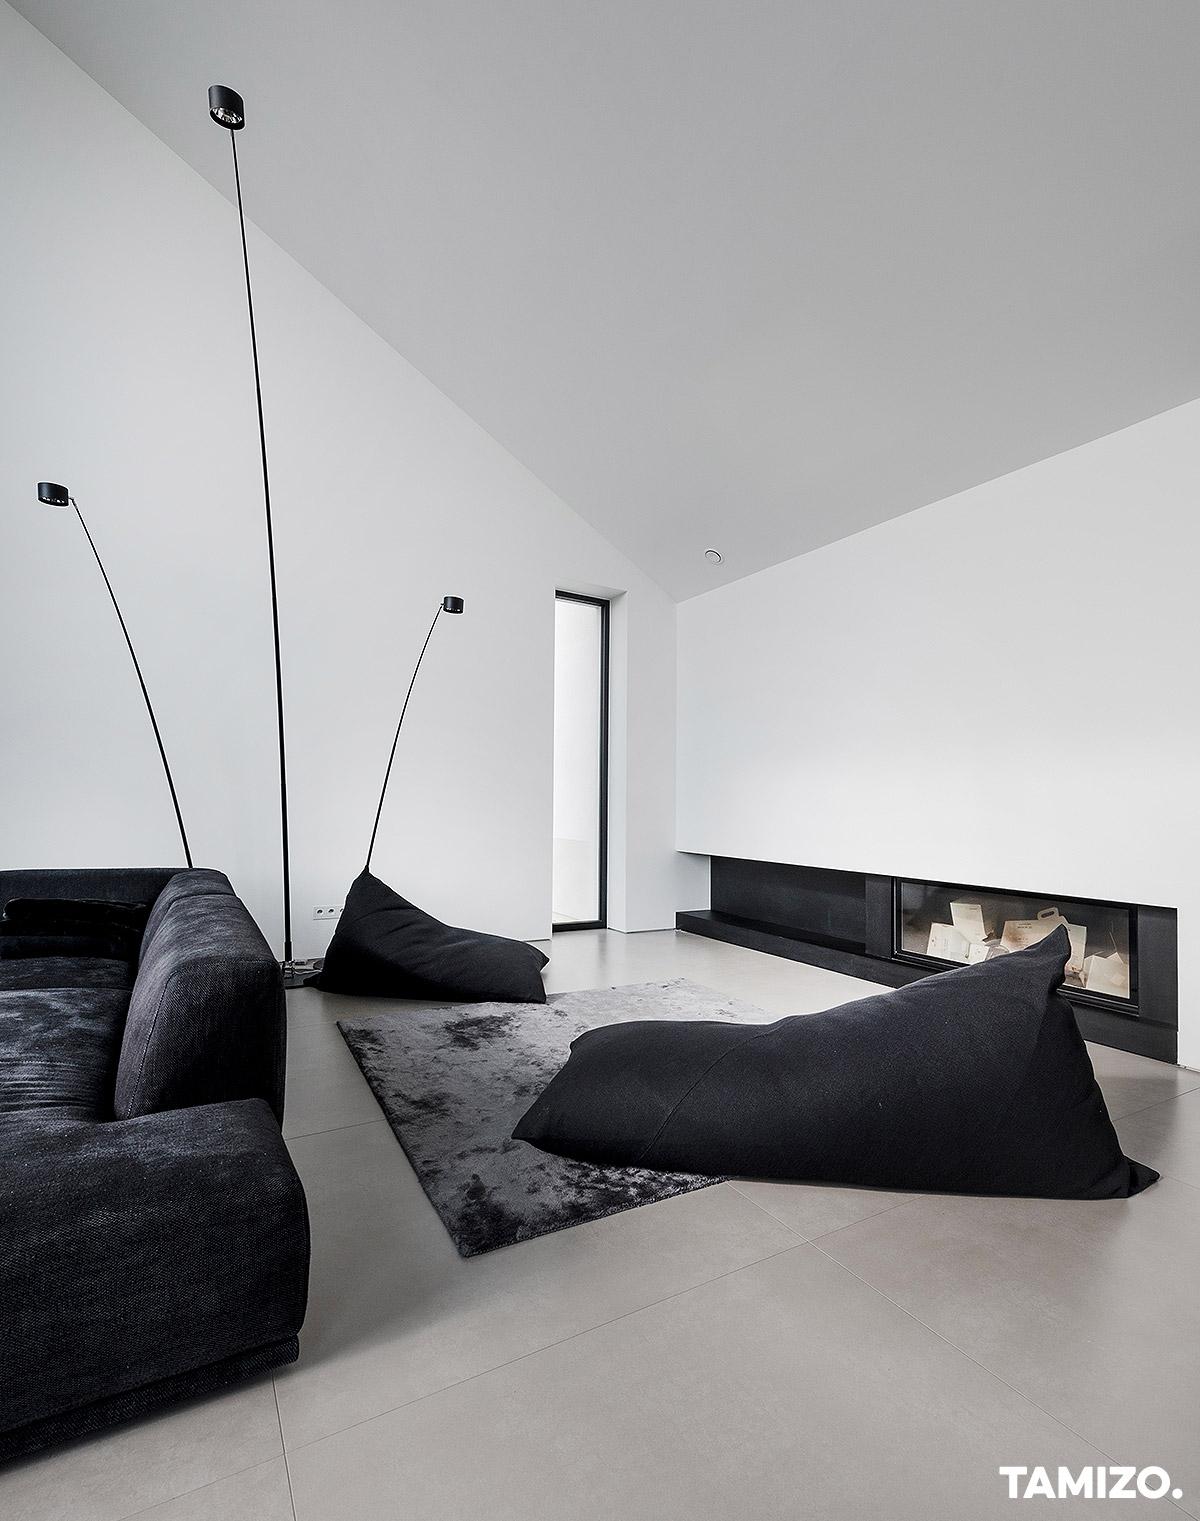 003_tamizo_architects_interior_house_realization_warsaw_poland_09